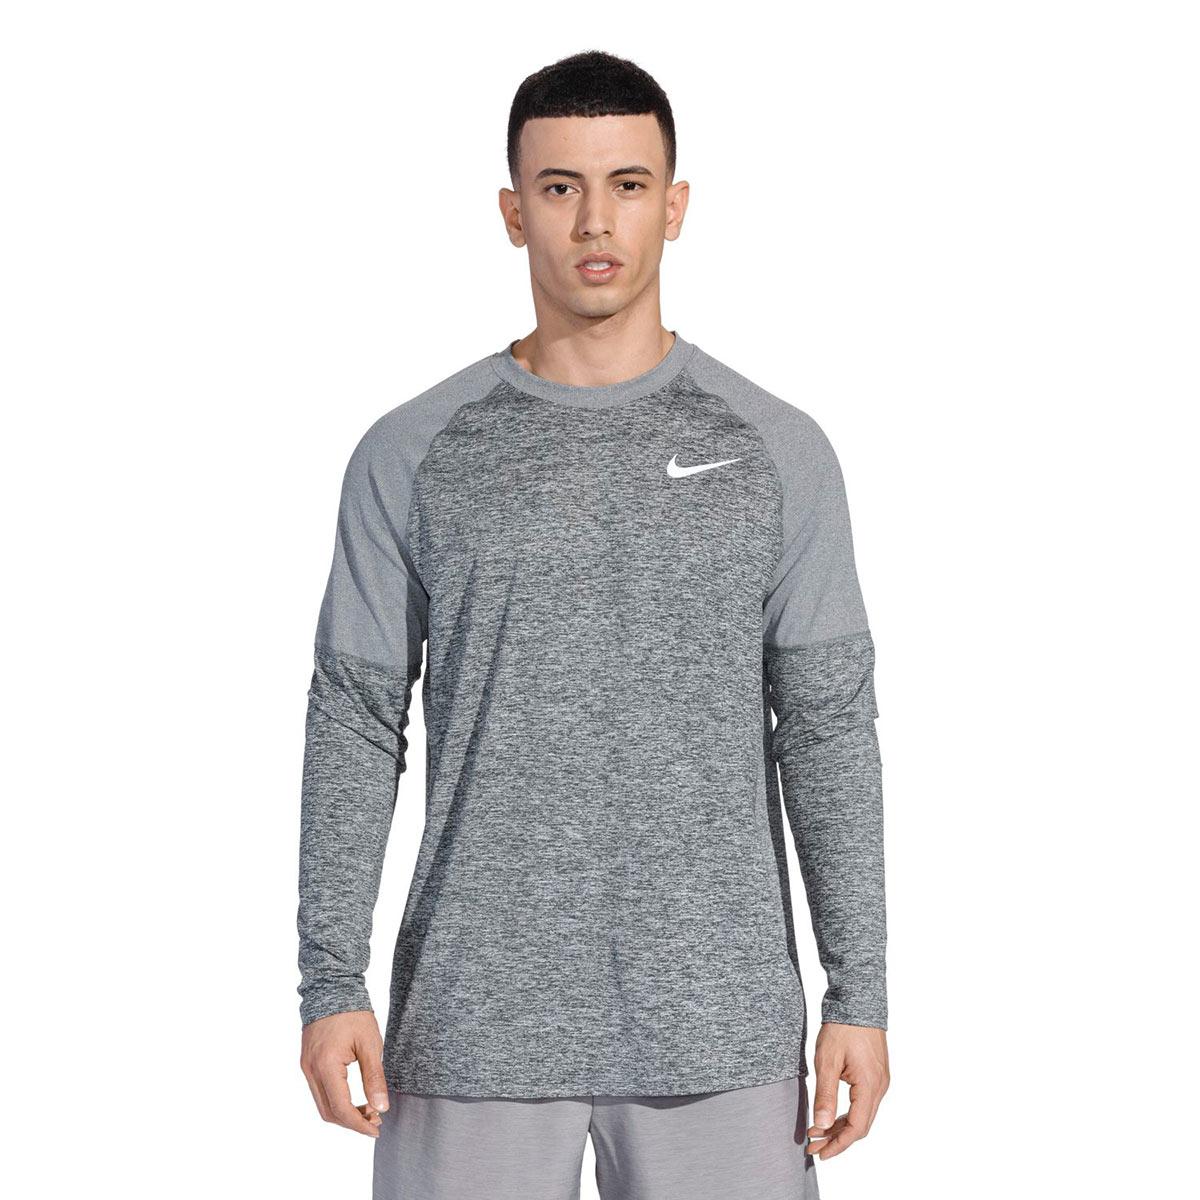 1cd231a3 Nike Element Longsleeeve Running Crew - Running tops for Men - Grey | 21RUN